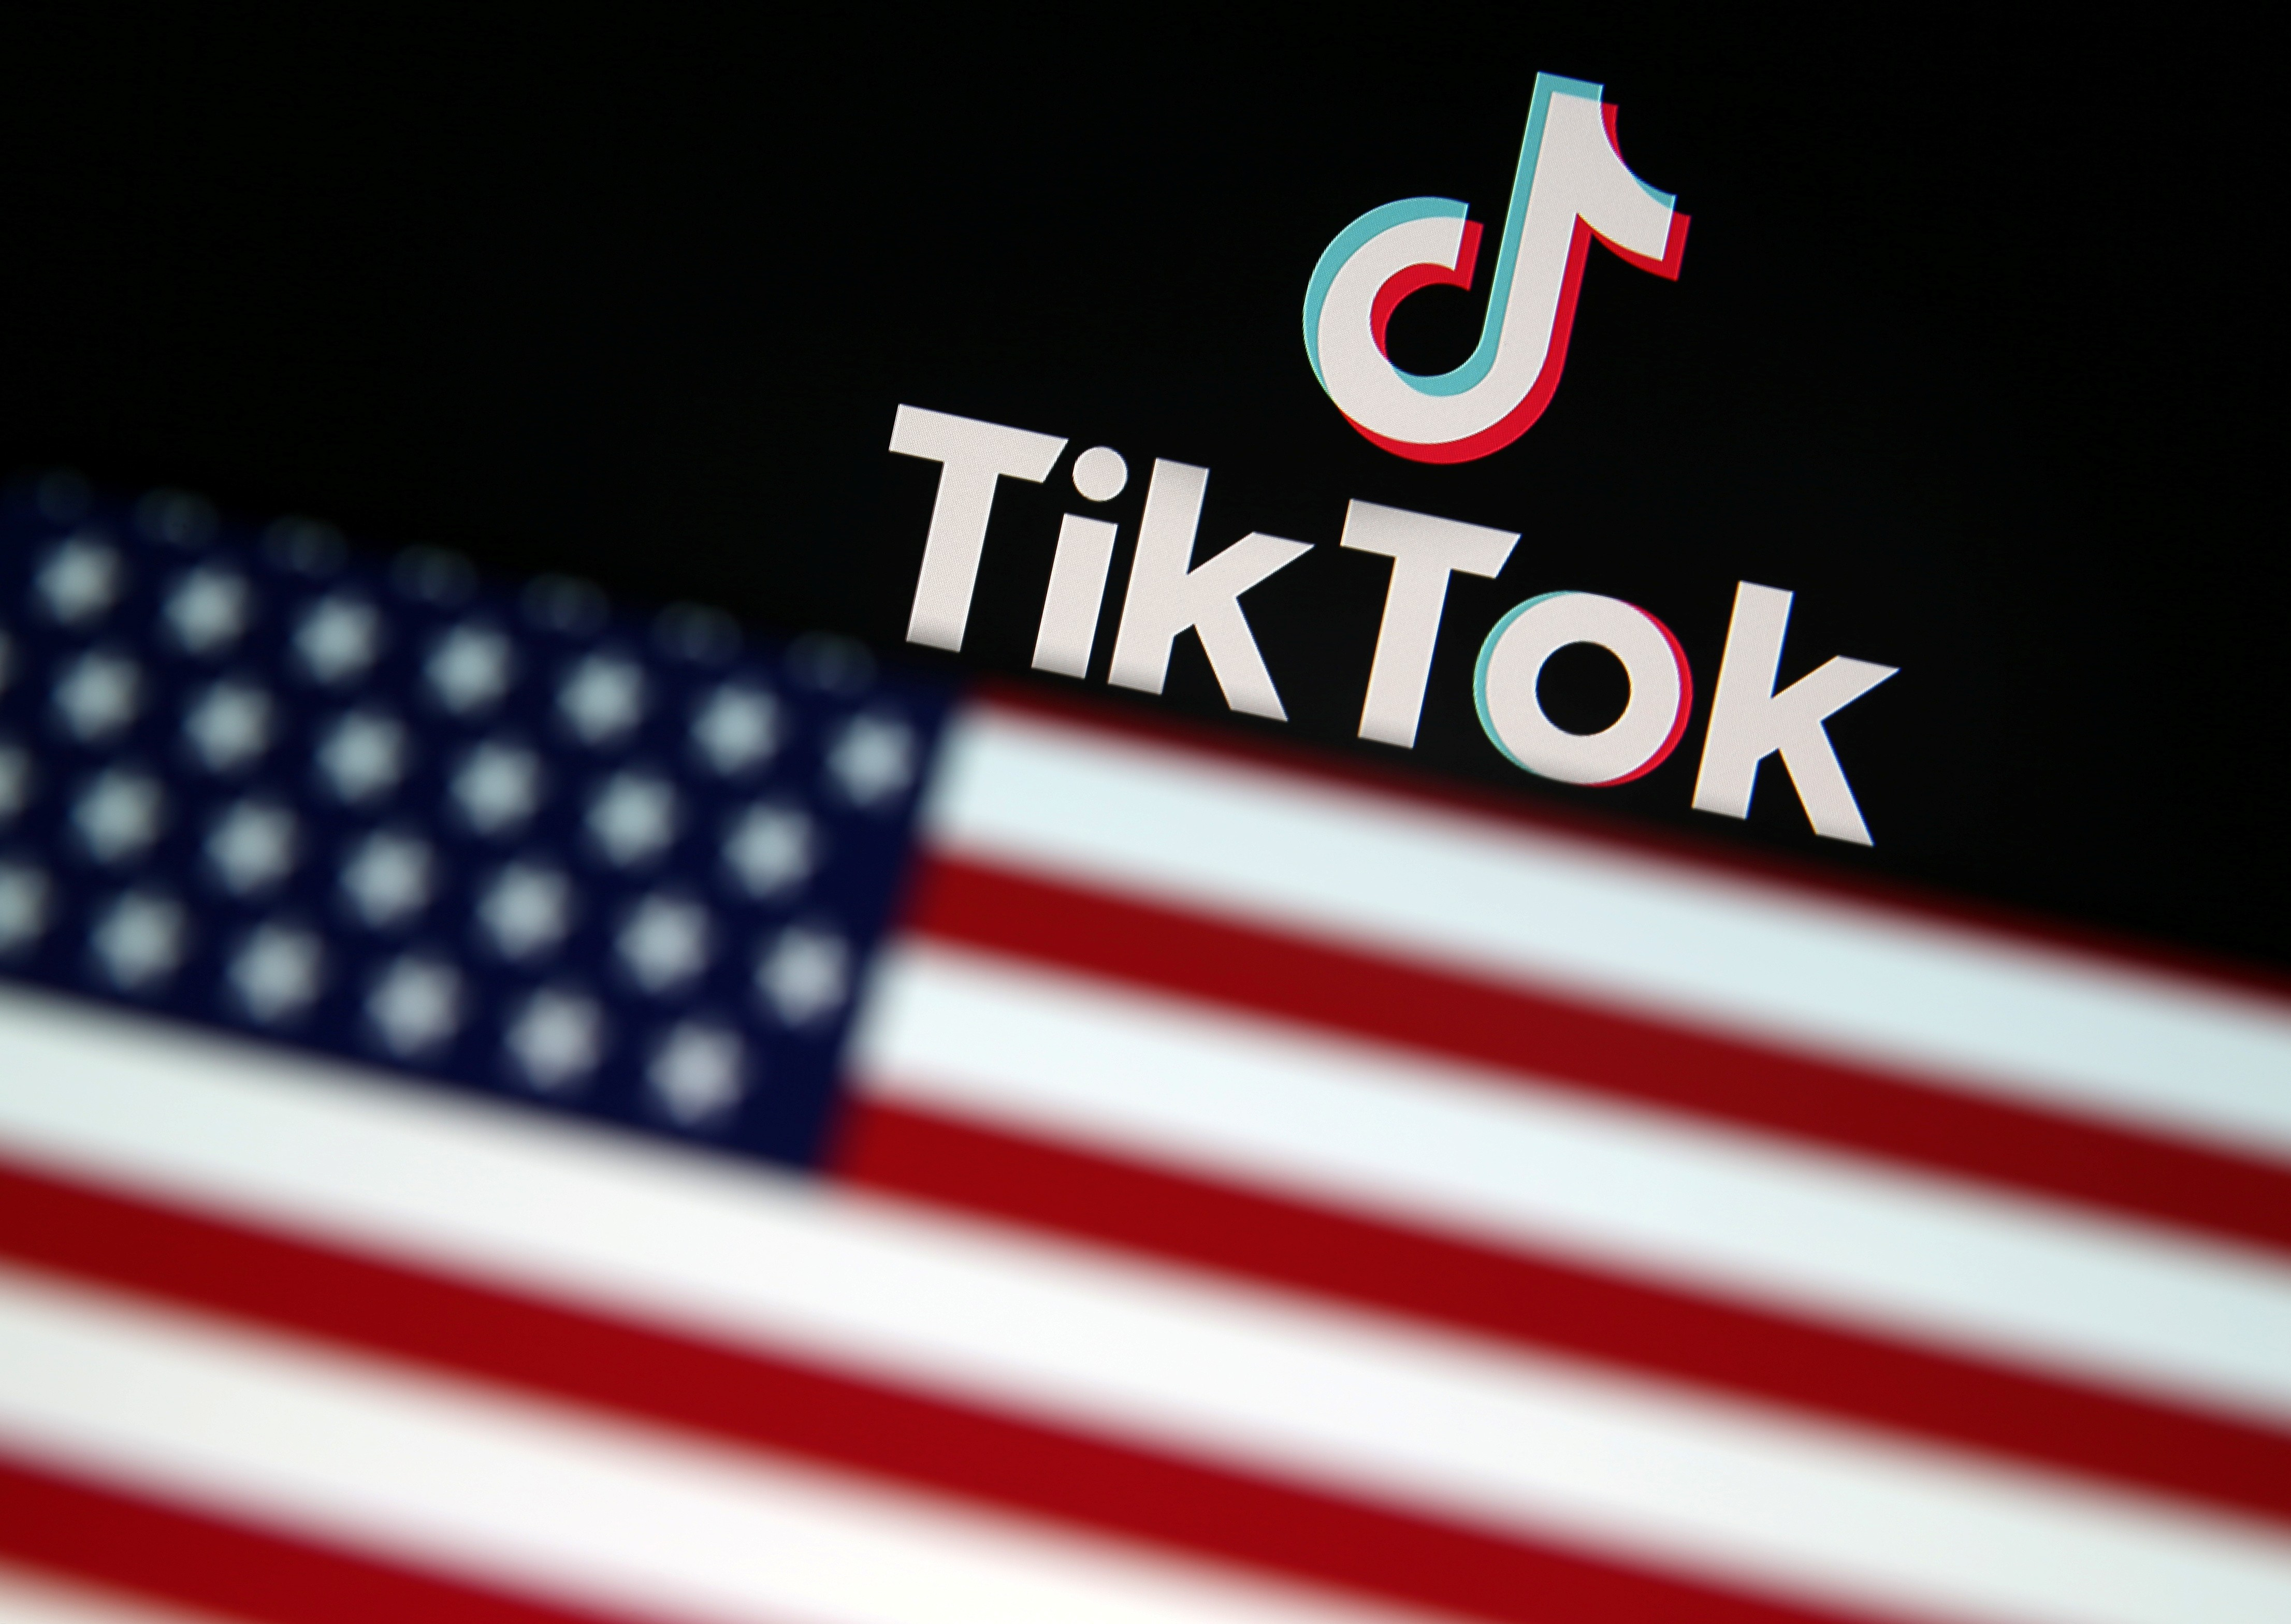 EUA voltam a prorrogar prazo para ByteDance vender TikTok